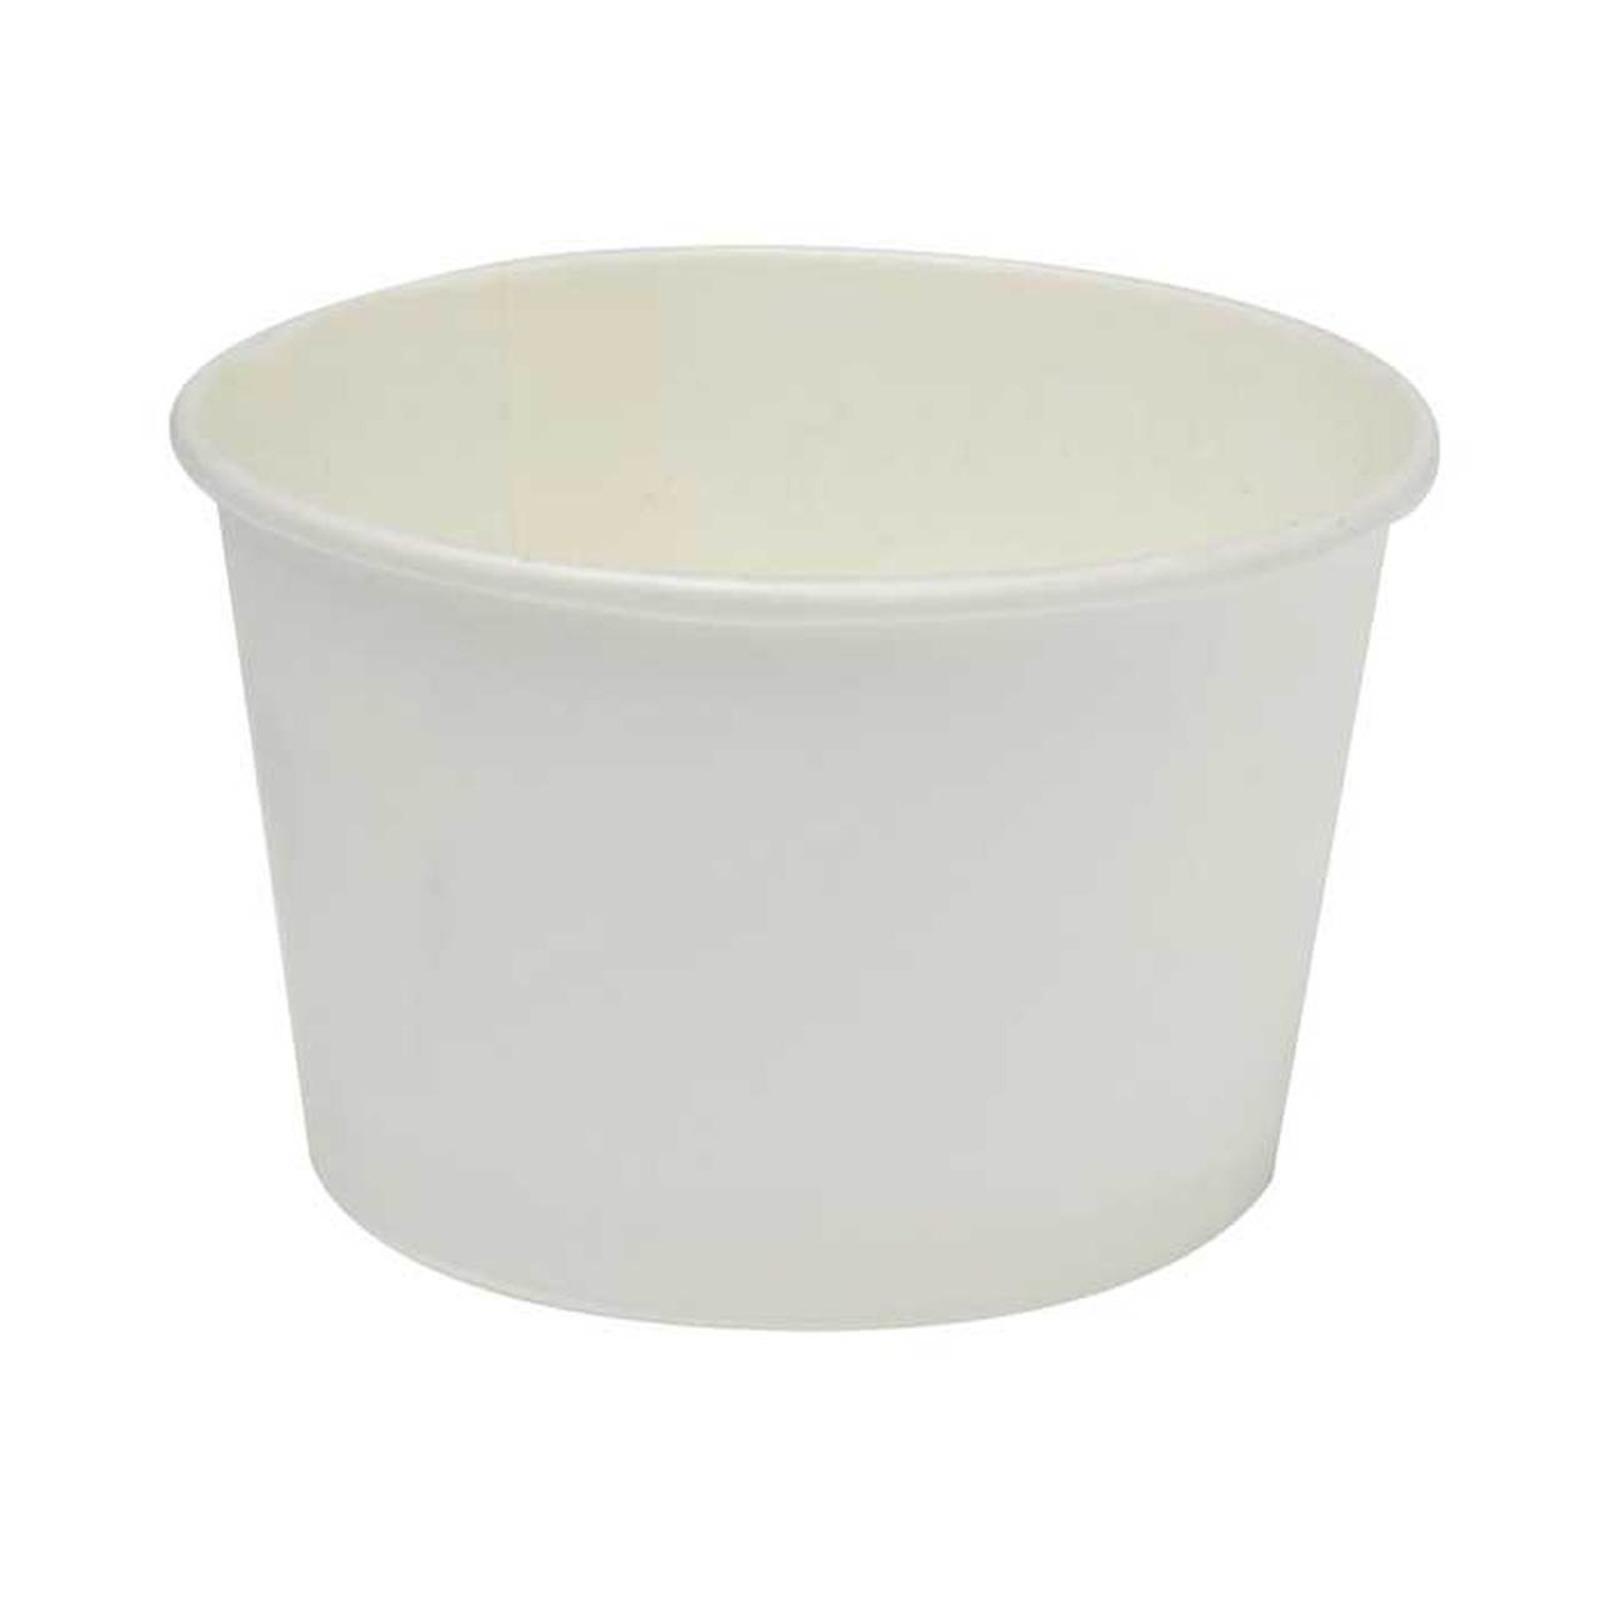 MTRADE Disposable 4 Oz Paper Ice Cream Cup